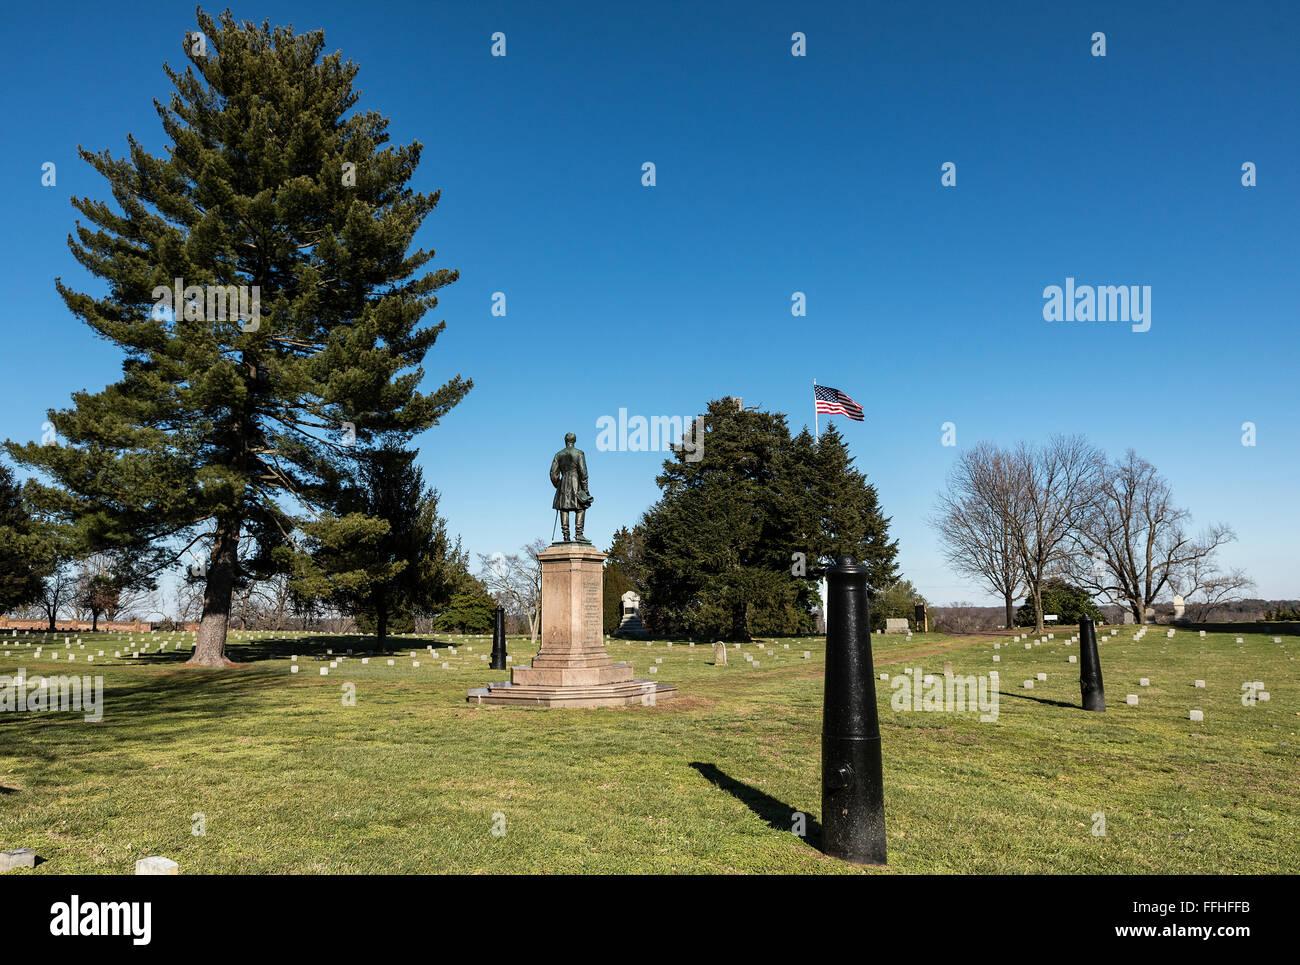 The Humphreys' Division Monument, Fredericksburg National Military Park, Fredericksburg, Virginia, USA - Stock Image